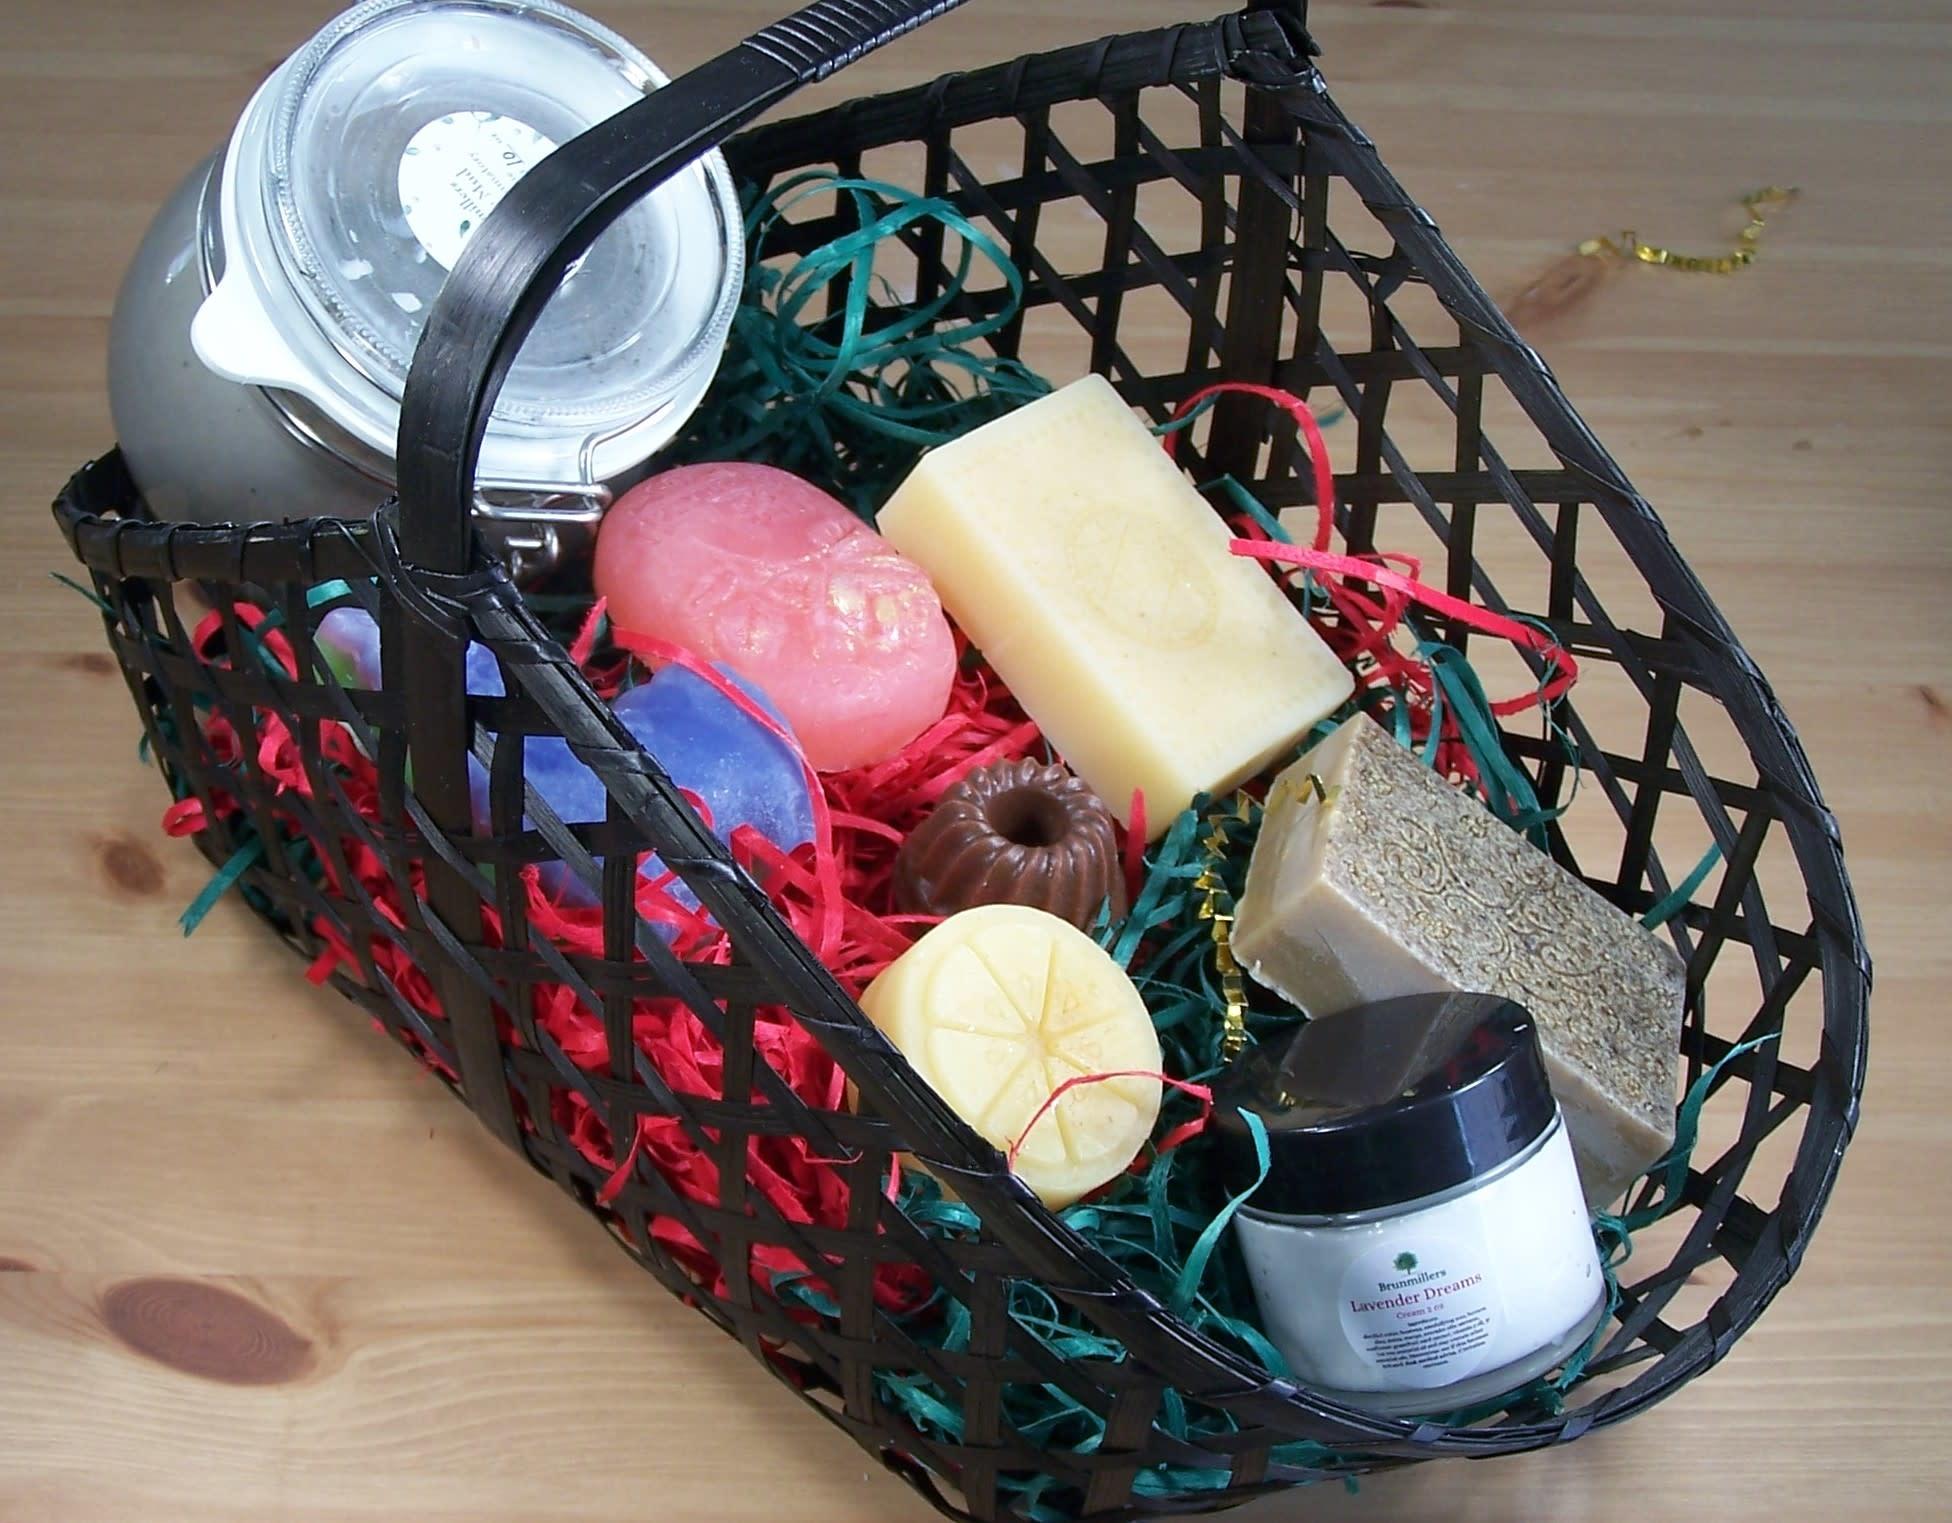 Gift Basket- Deluxe Spa: Bath Bar, Massager Bar, Miracle Mud, Bath Fizzy Salts, Foot Soak, & Nail Brush & Body Cream